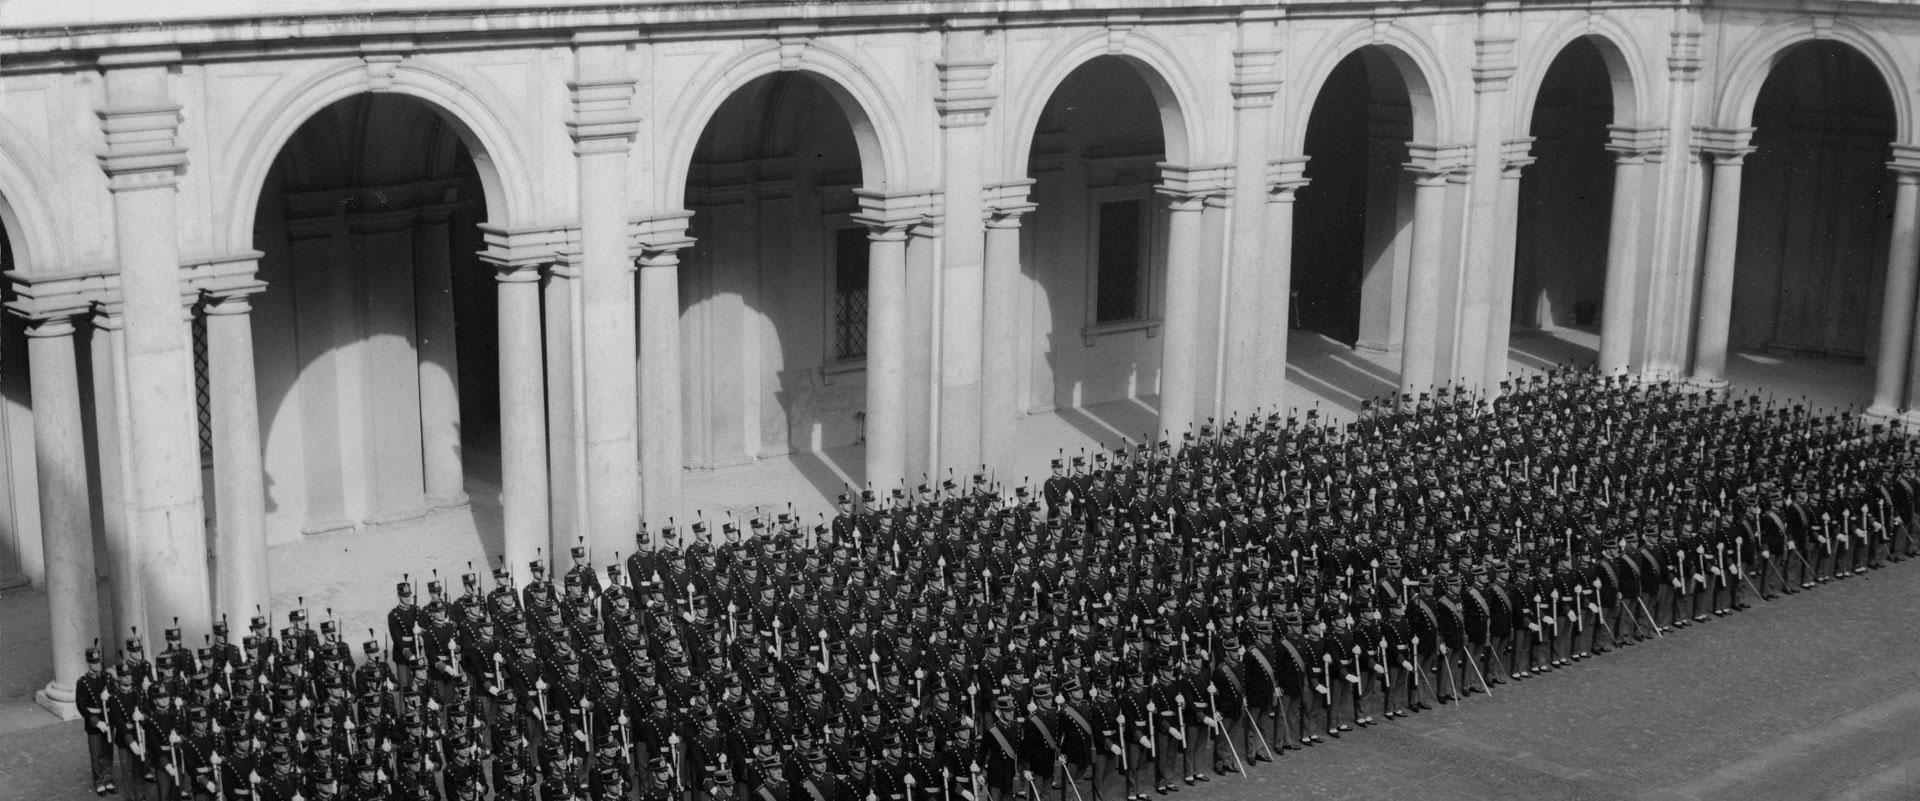 Gruppo di ricerca storica dal 1919